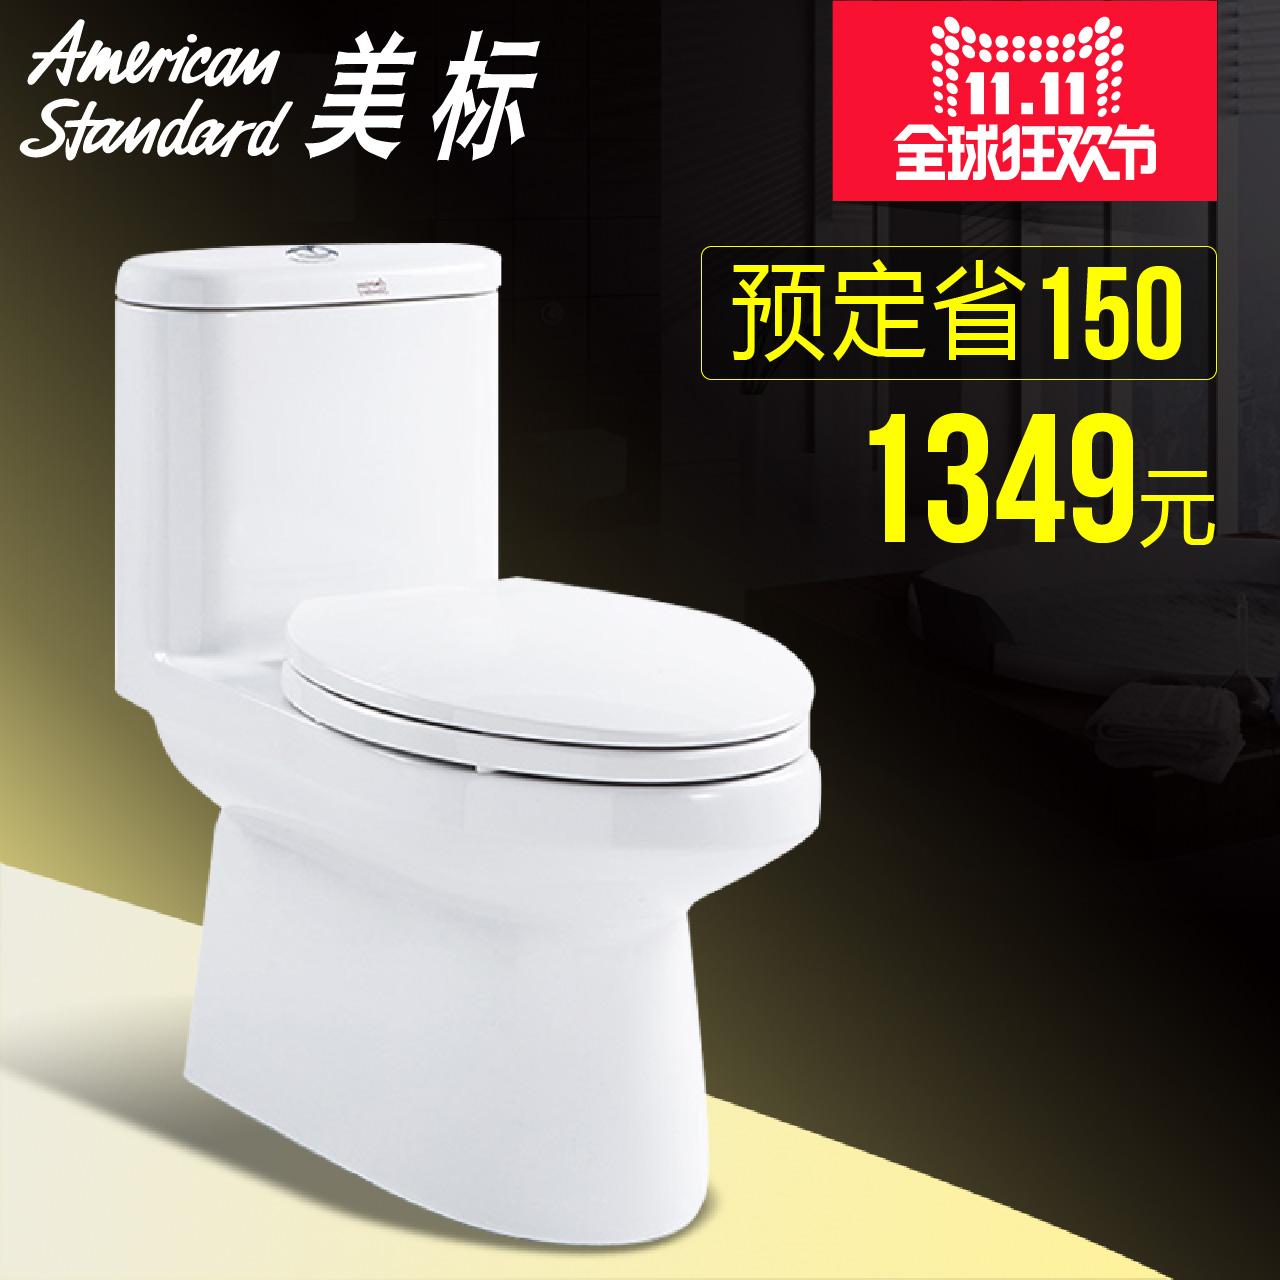 China American Standard Toilet, China American Standard Toilet ...